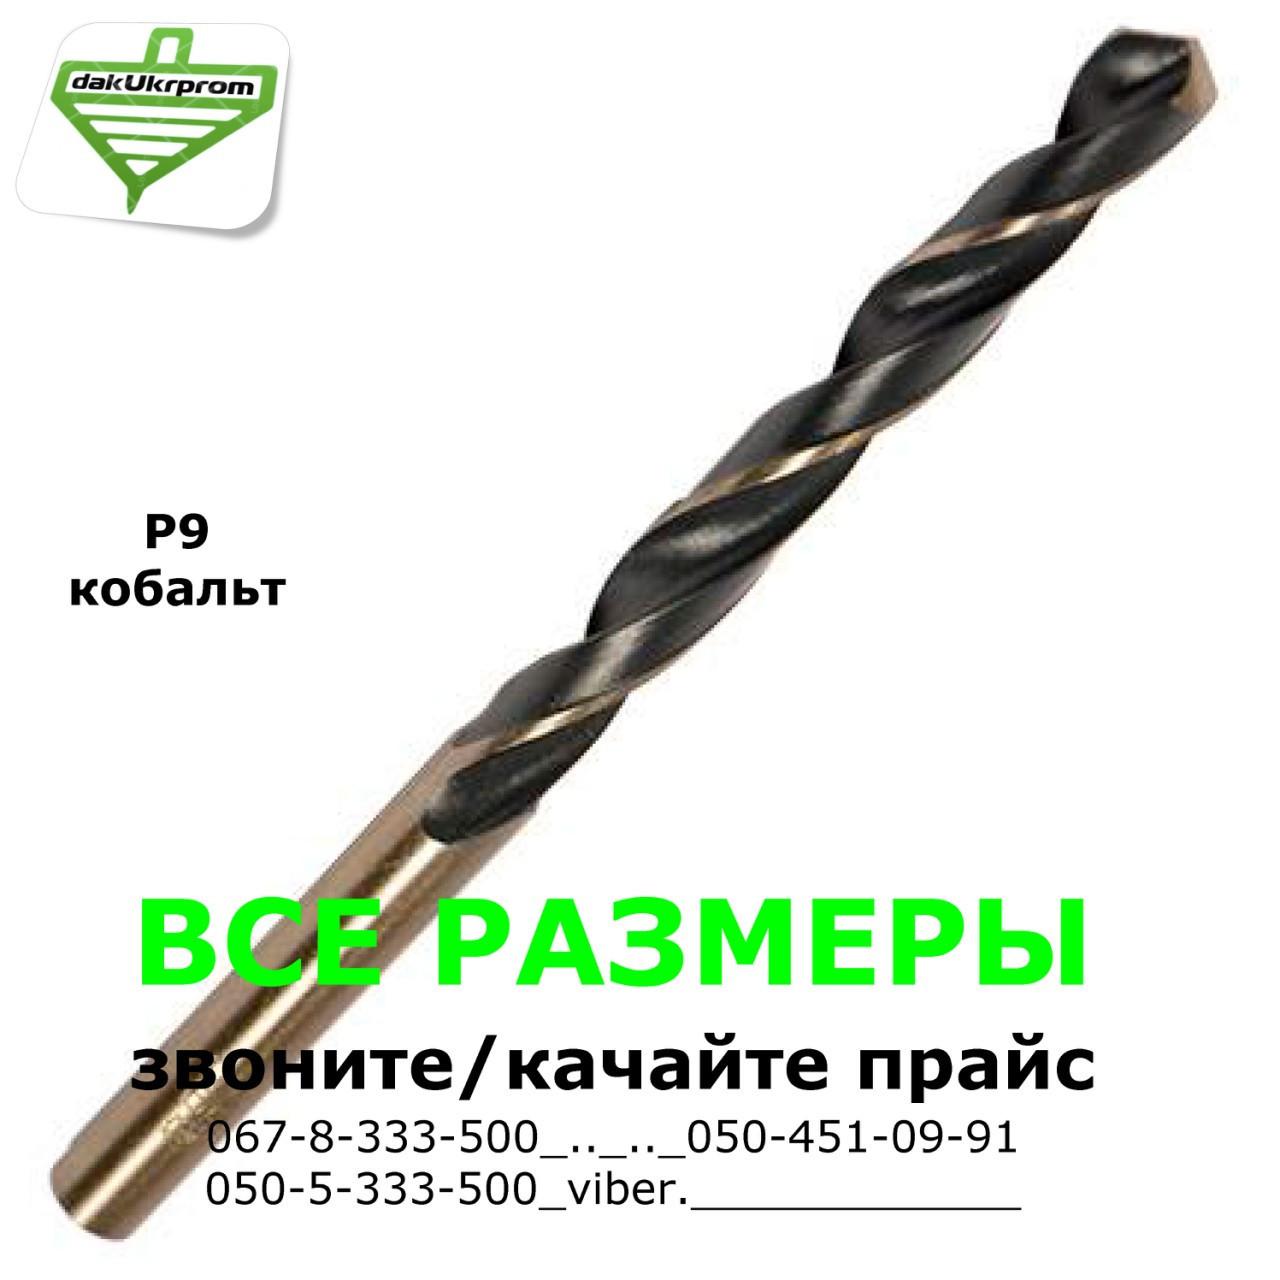 Сверло по металлу 7.5 мм  Р9 (кобальт)цилиндрический хвостовик